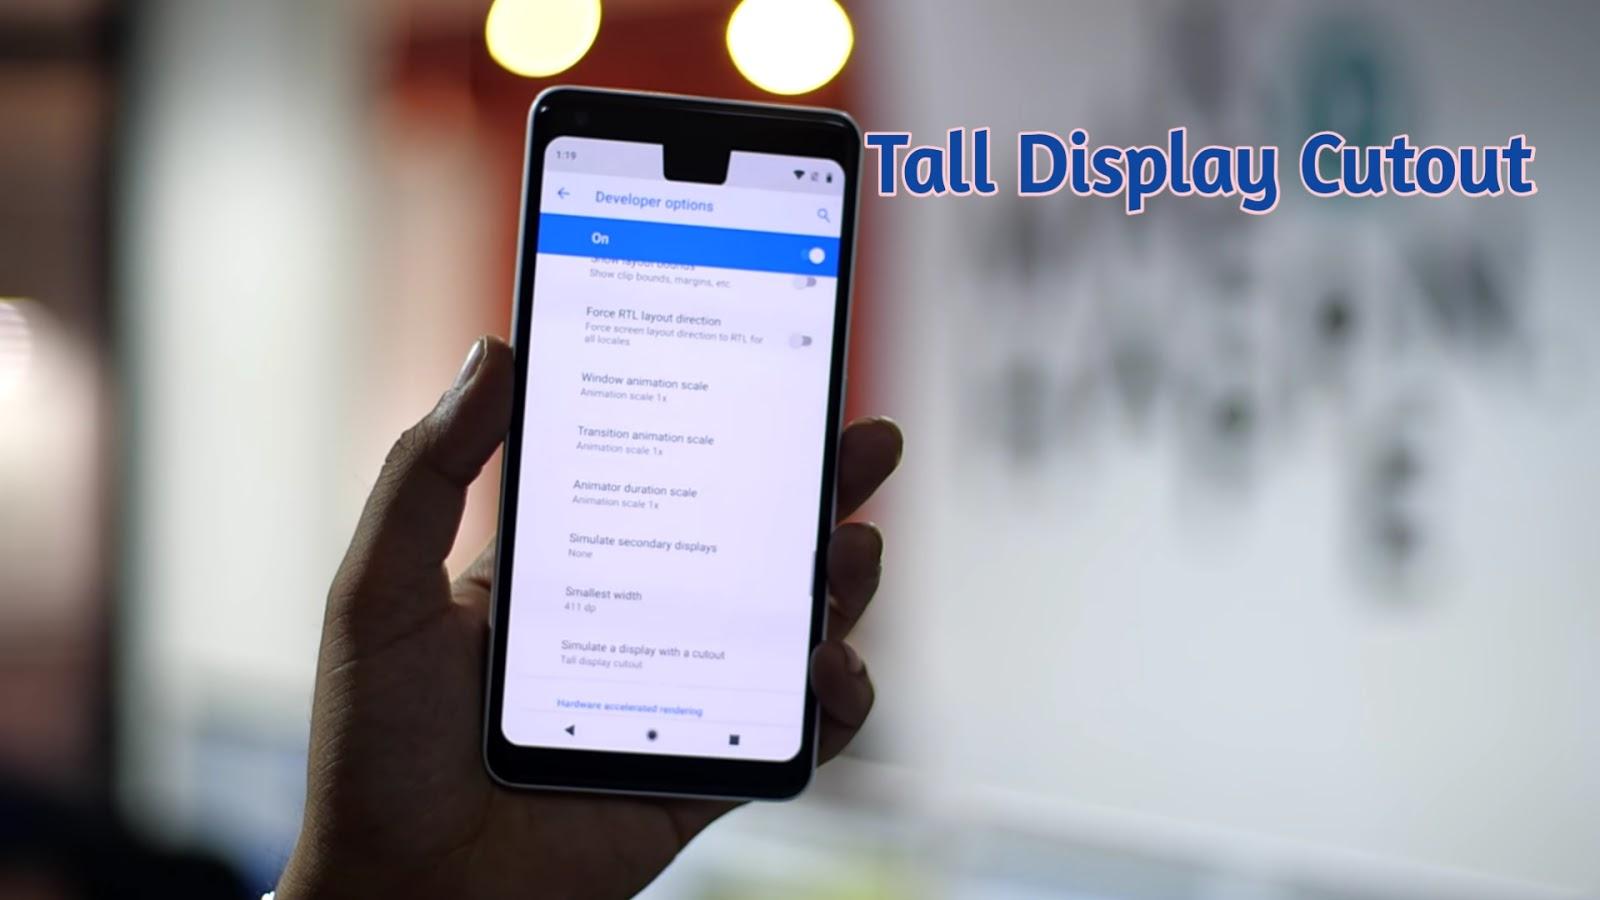 The tall display cutout